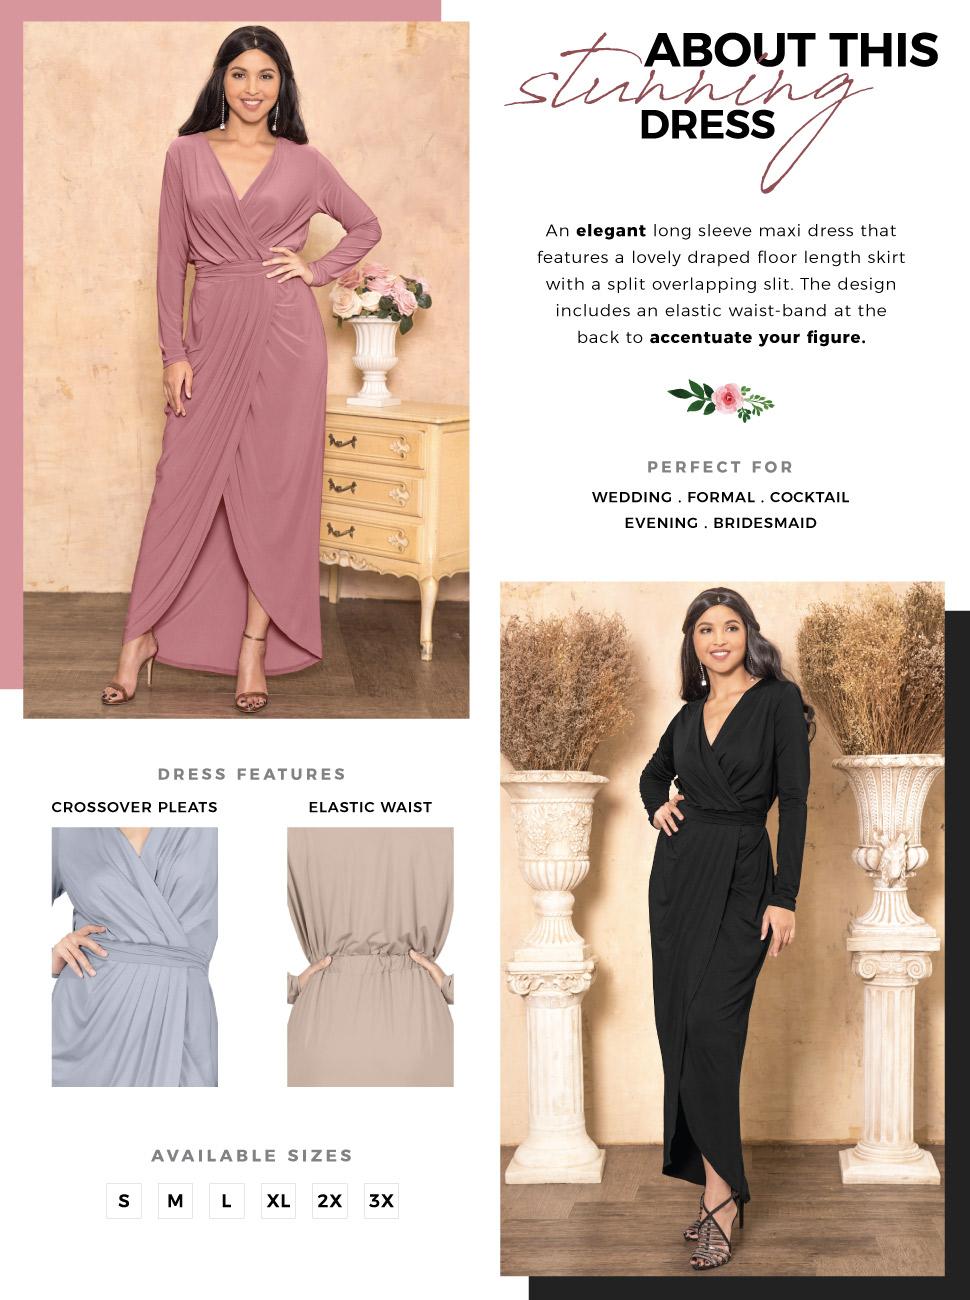 73bb1fadb6b KOH KOH Womens Long Sleeve Formal Wrap Draped Cocktail V-Neck Gown Maxi  Dress